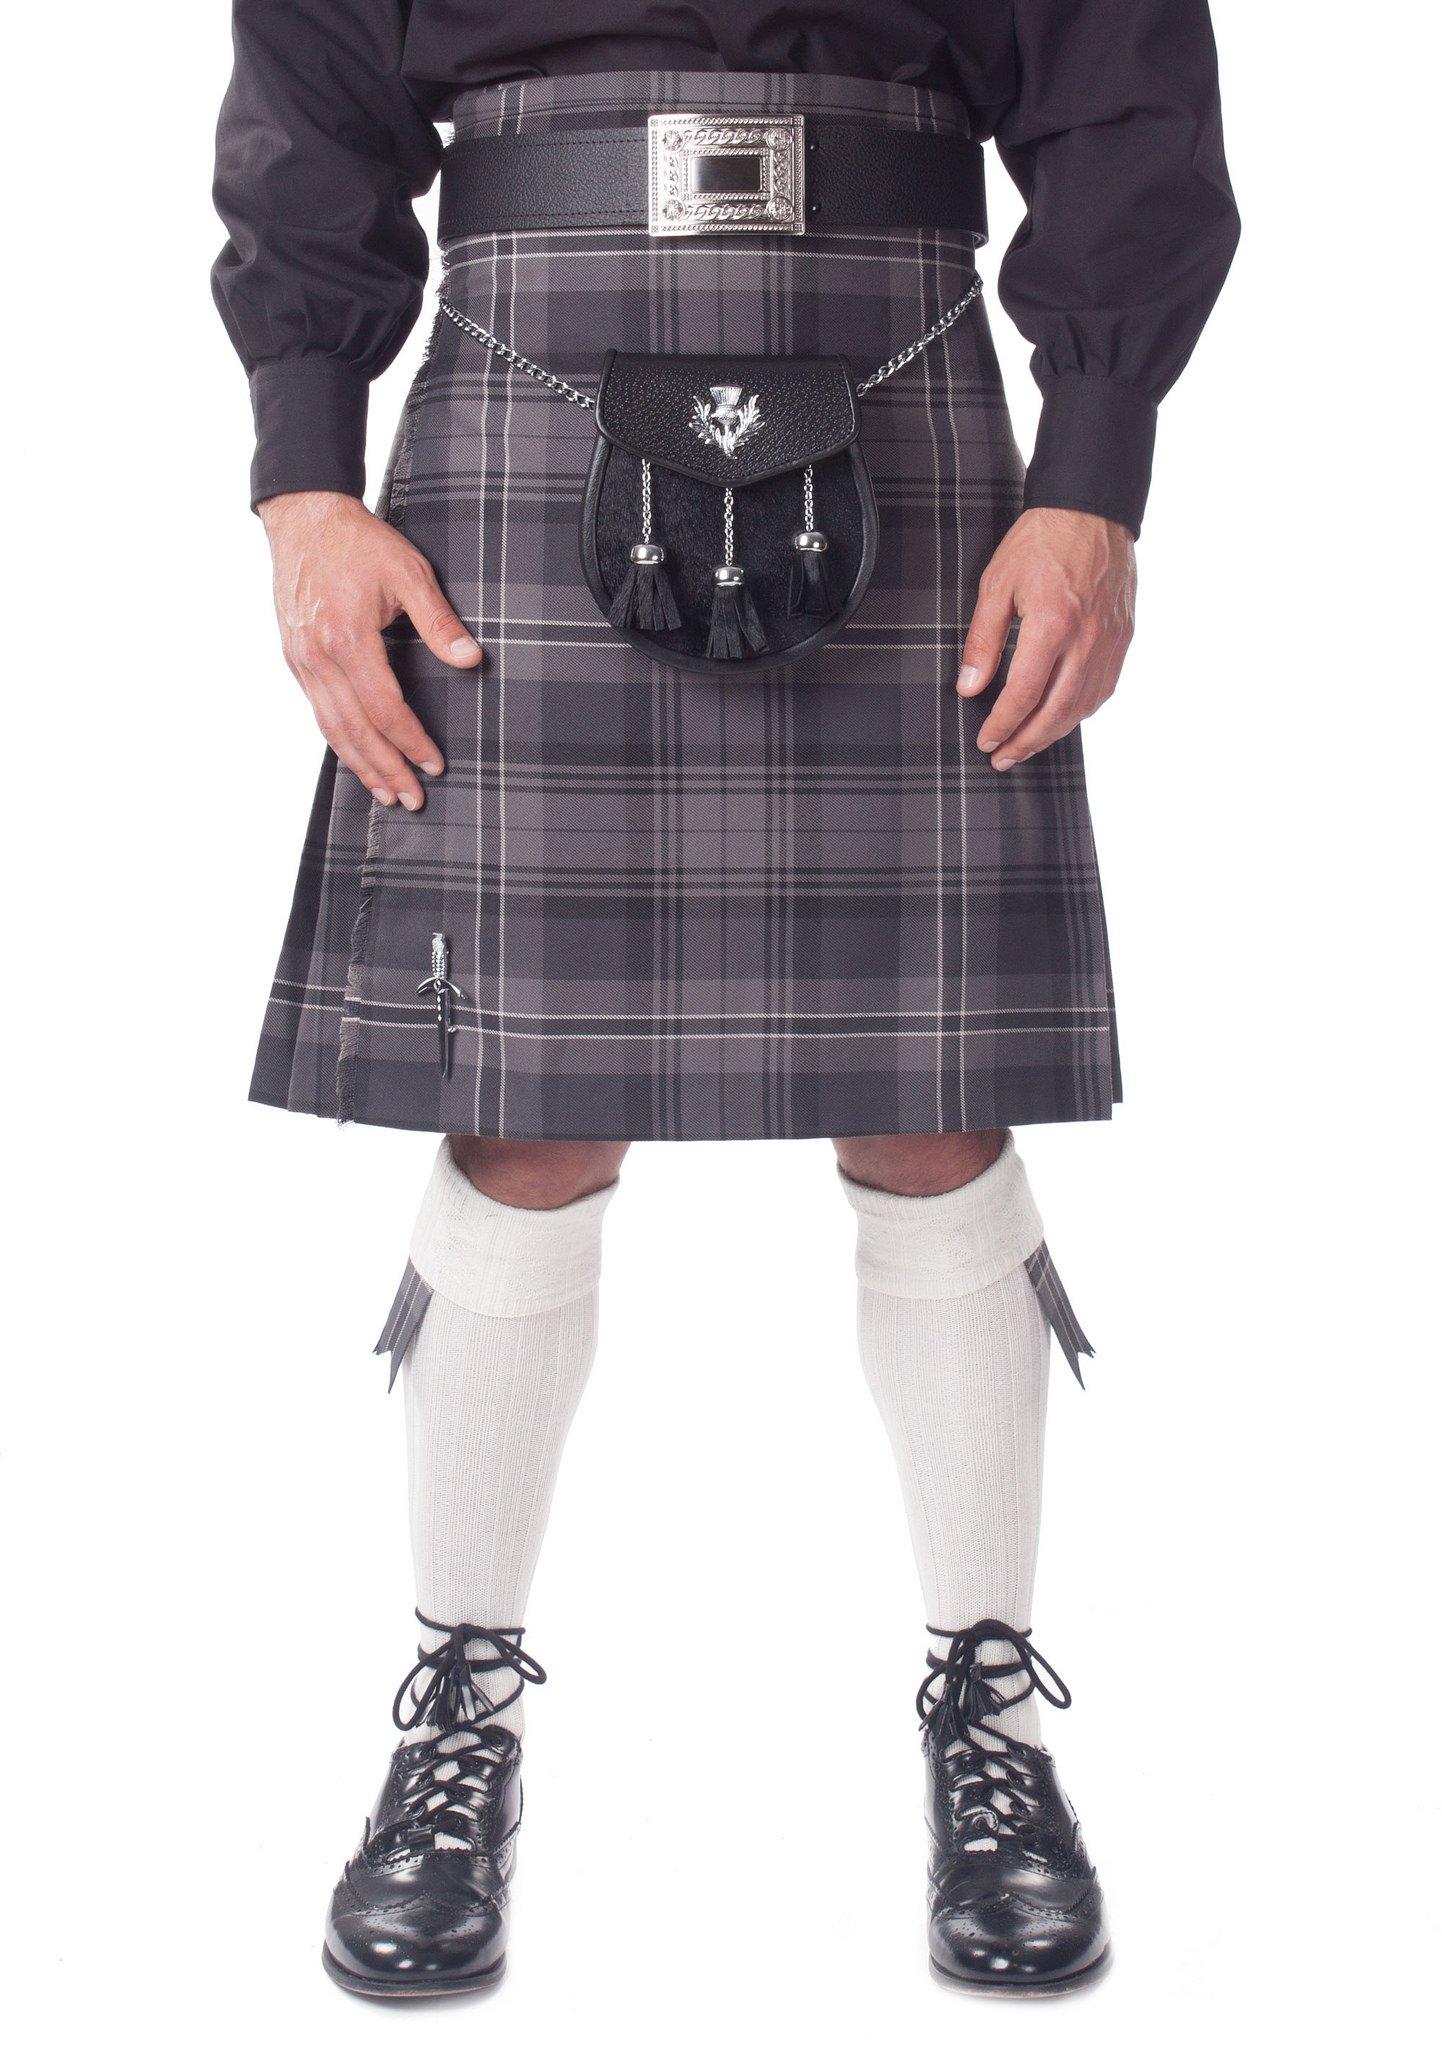 Kilt Society Mens 7 Piece Semi Dress Kilt Outfit- Hamilton Tartan with White Hose 46'' to 50''